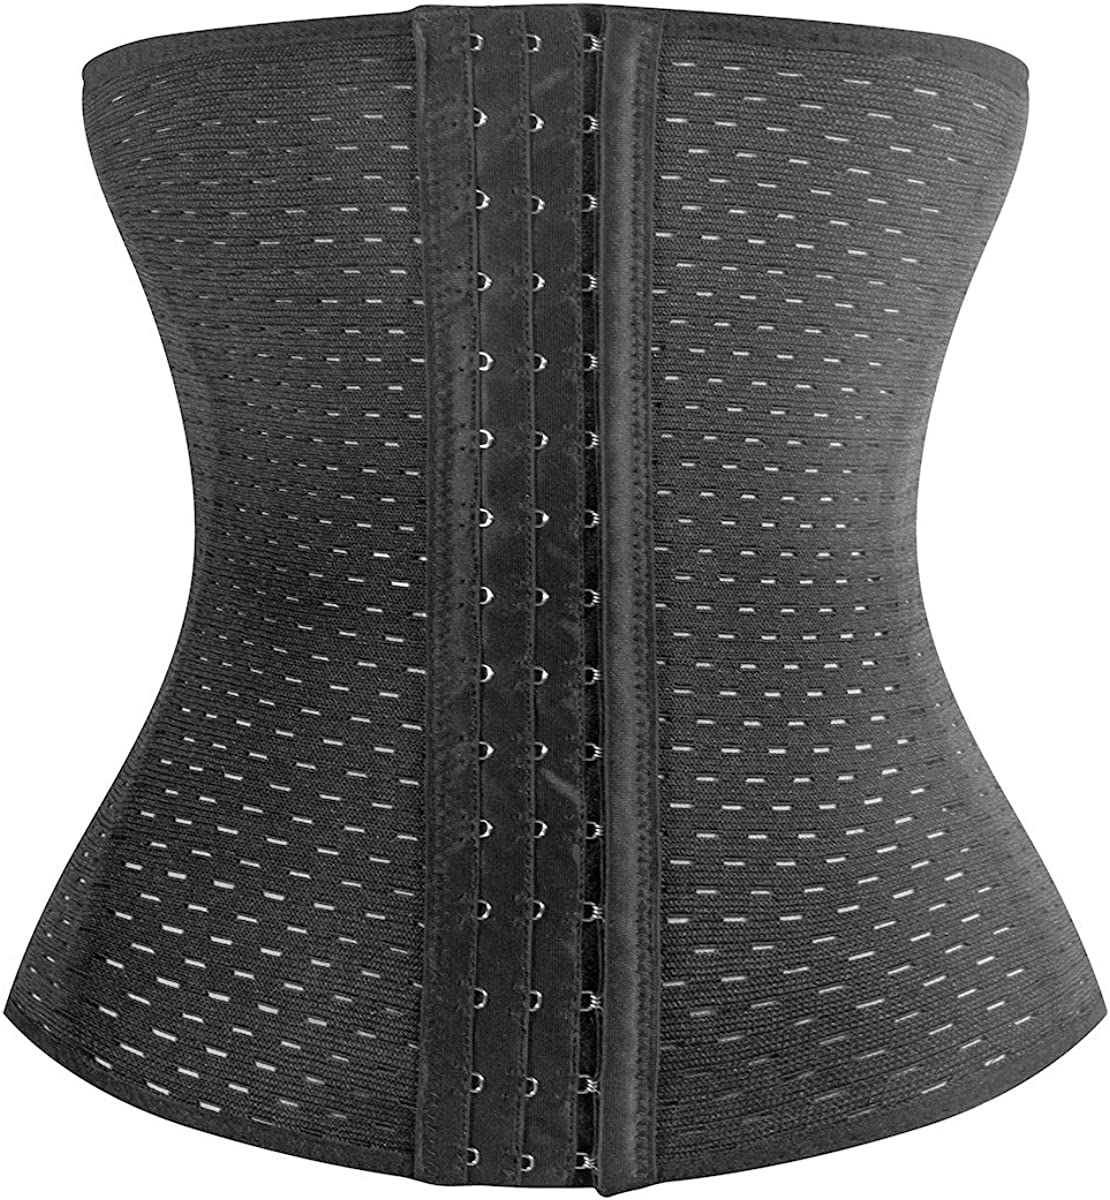 KSKshape Waist Trainer Corset for Weight Loss Breathable Shapewear Back Support Girdle